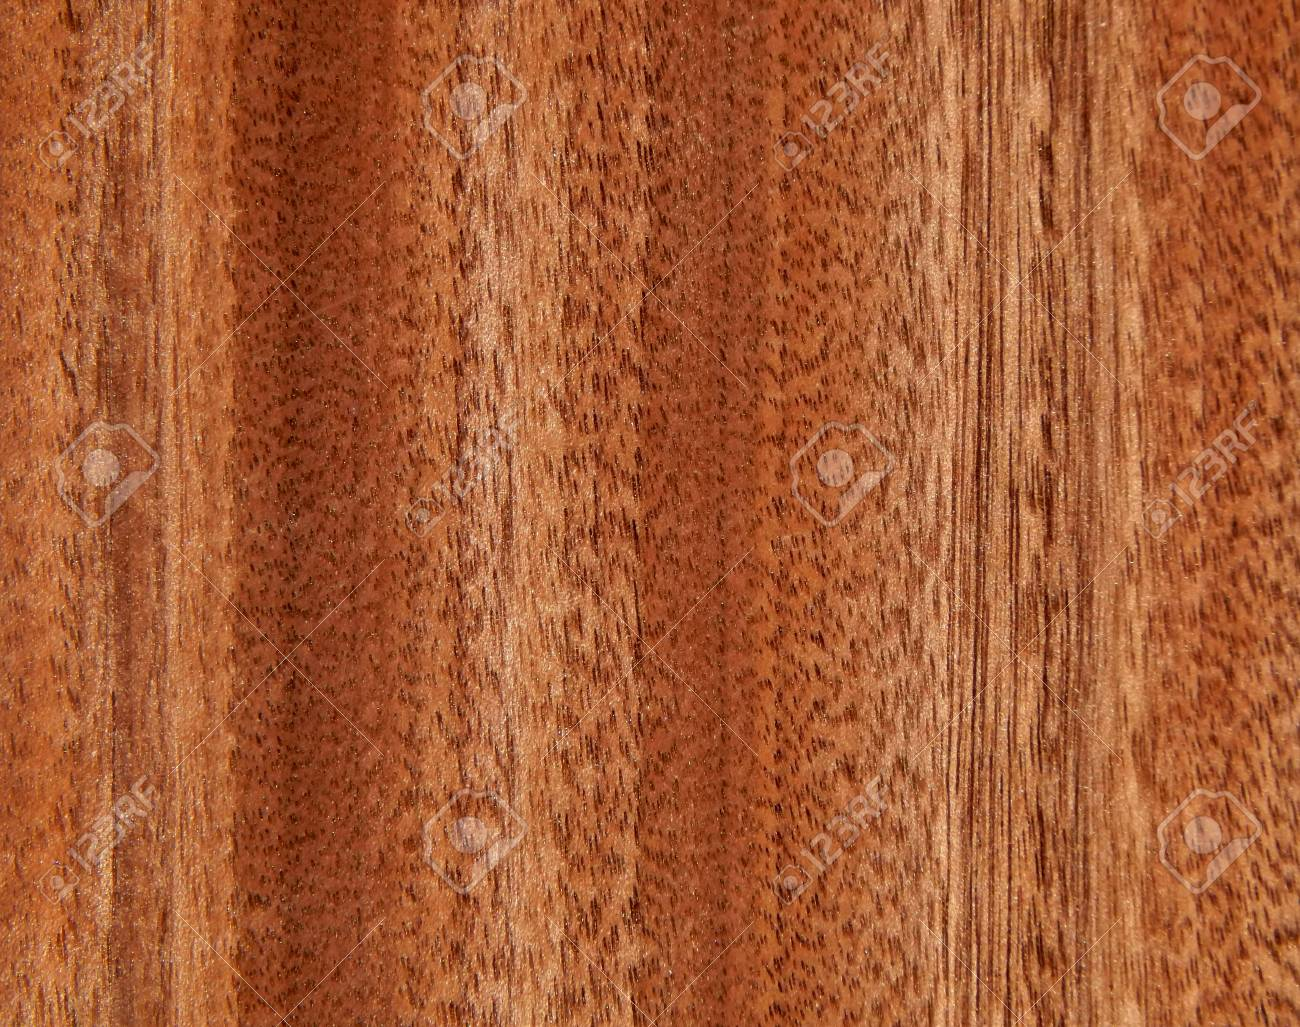 Real Wood Veneer American Walnut Material For Interior And Furniture